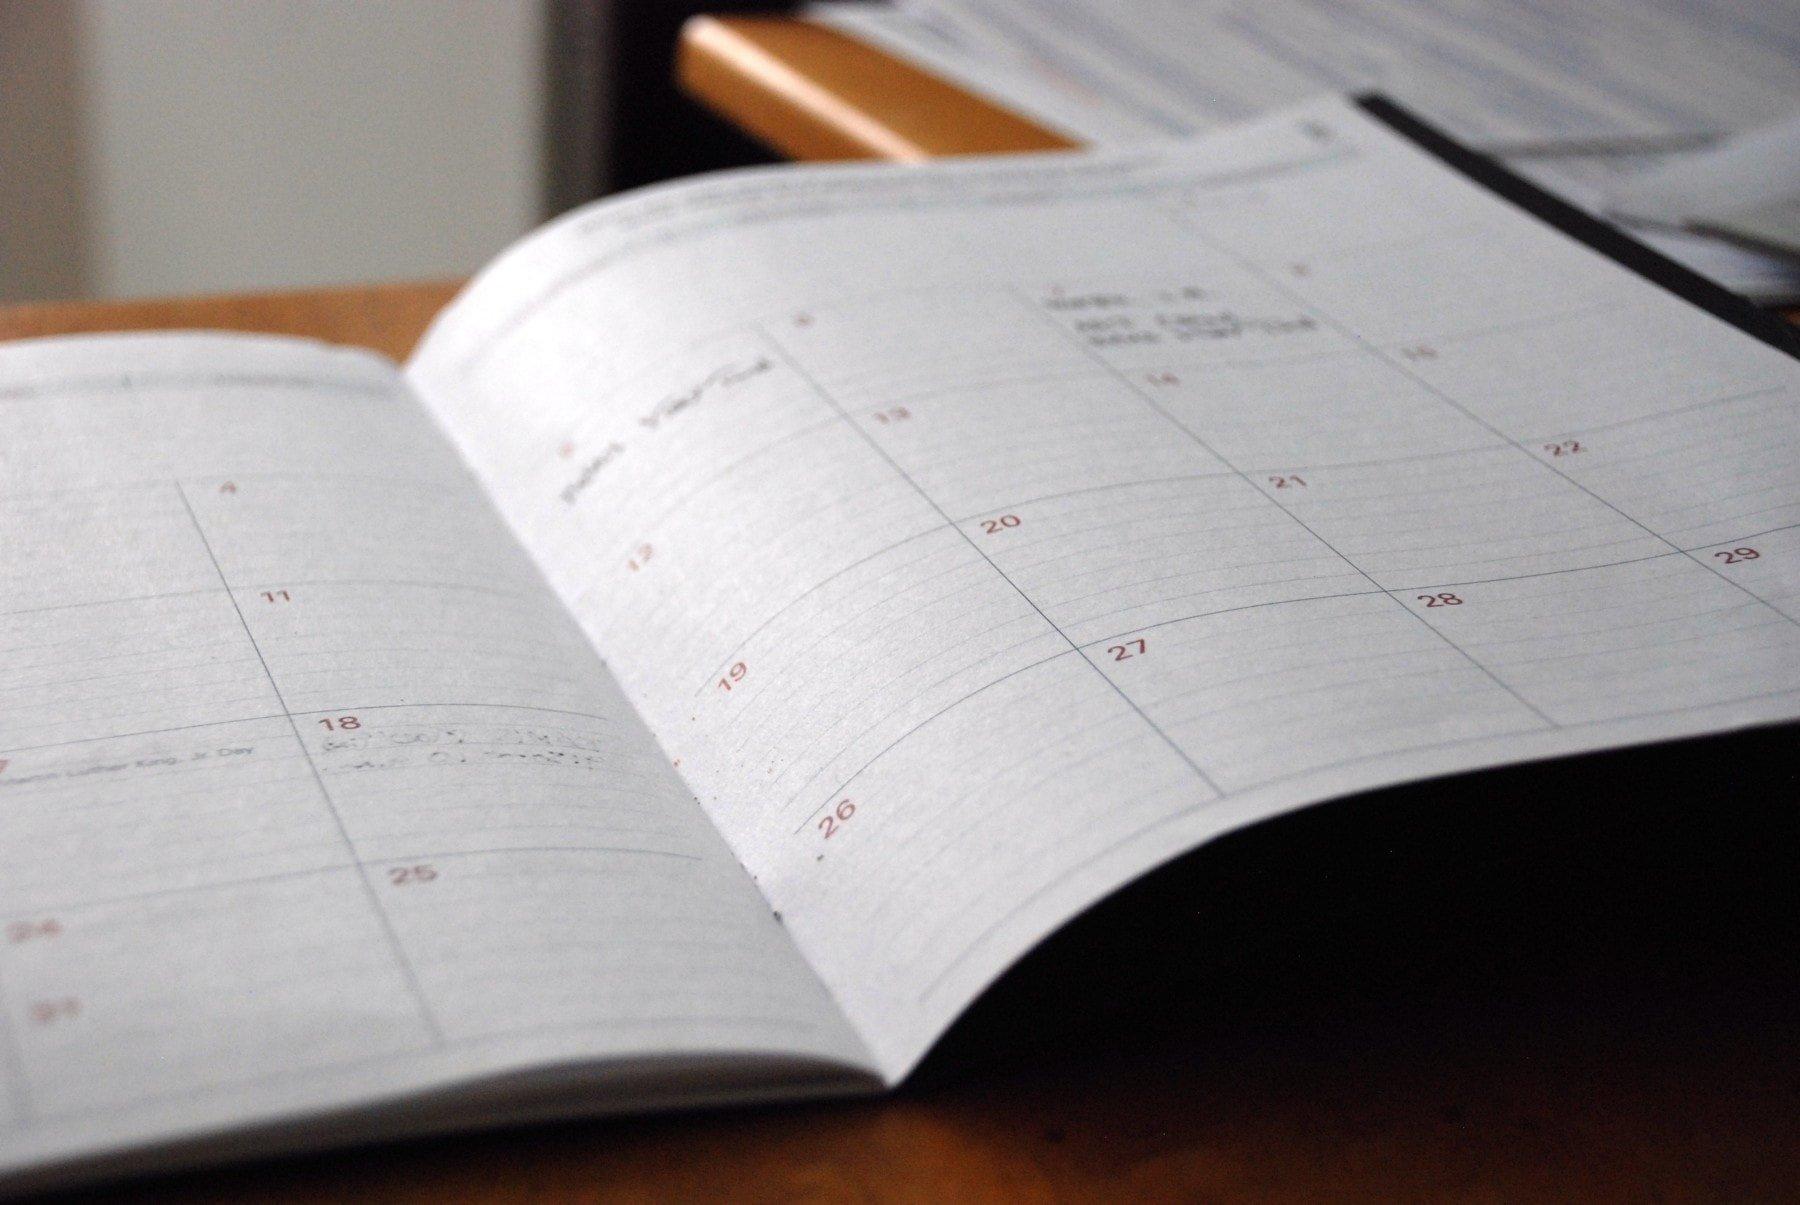 agenda book